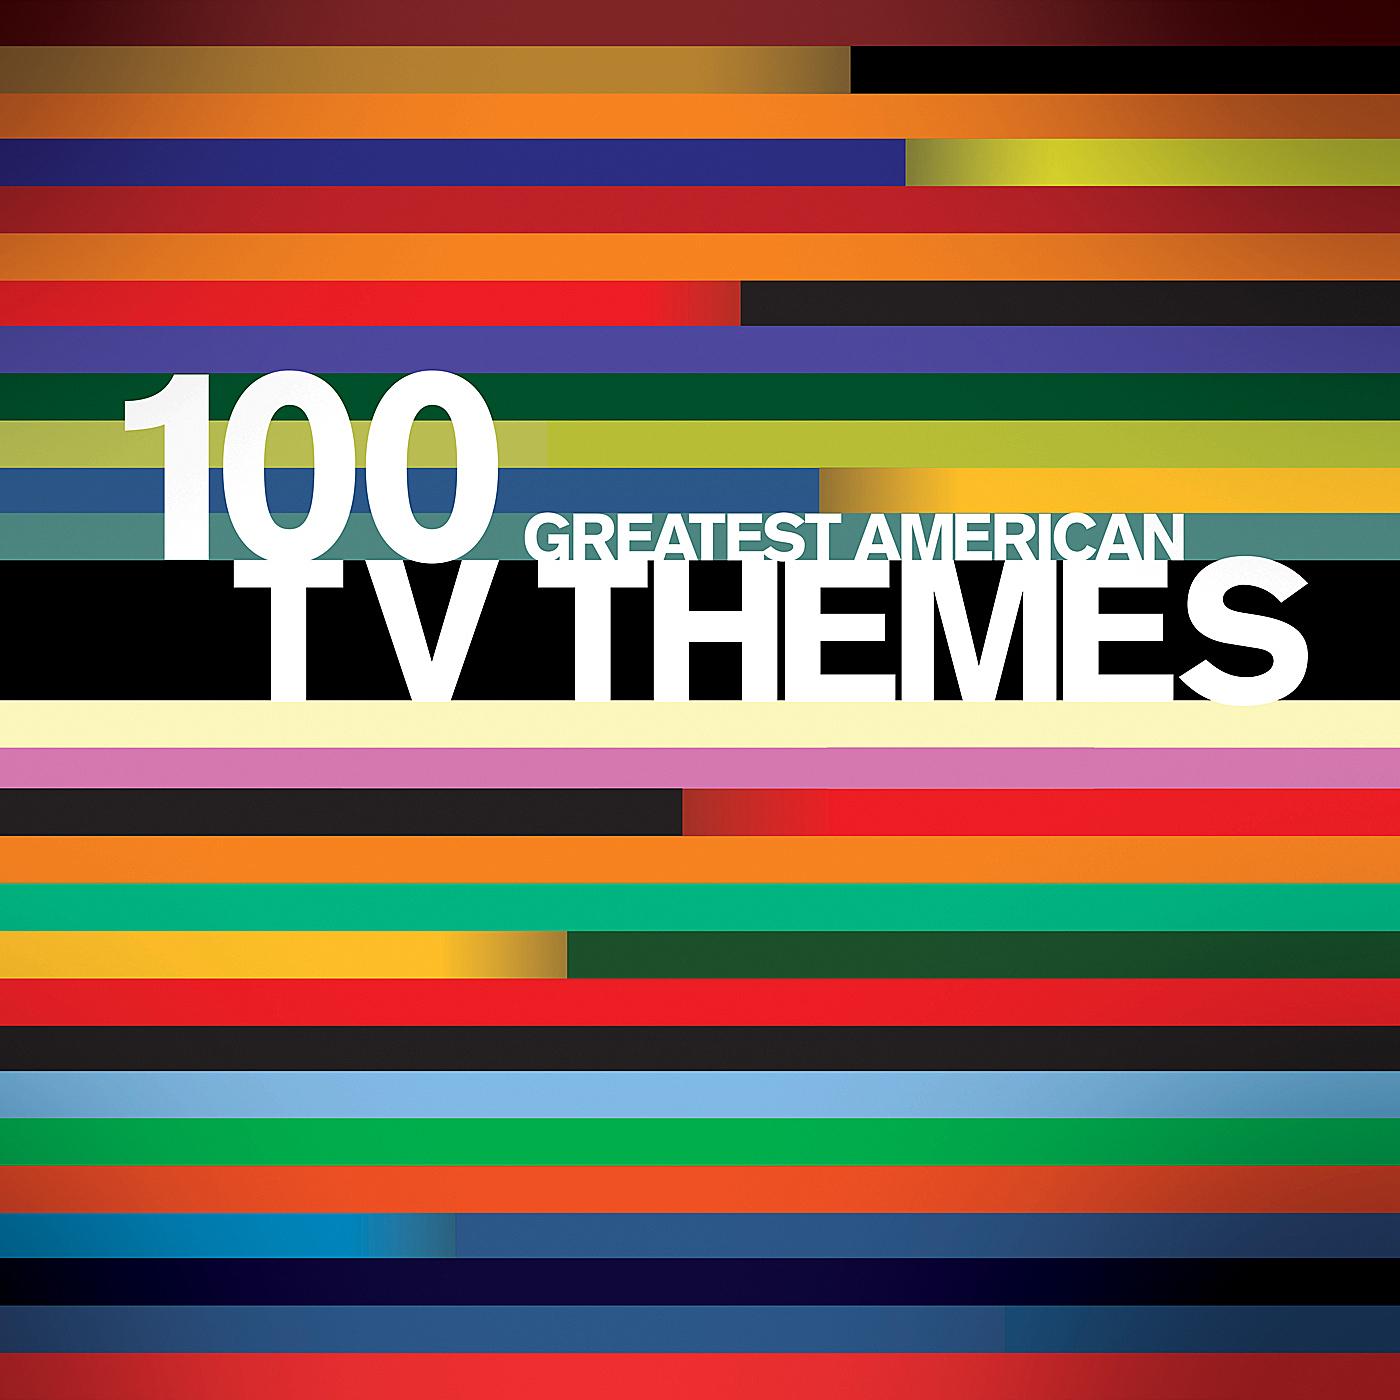 100 Greatest American TV Themes